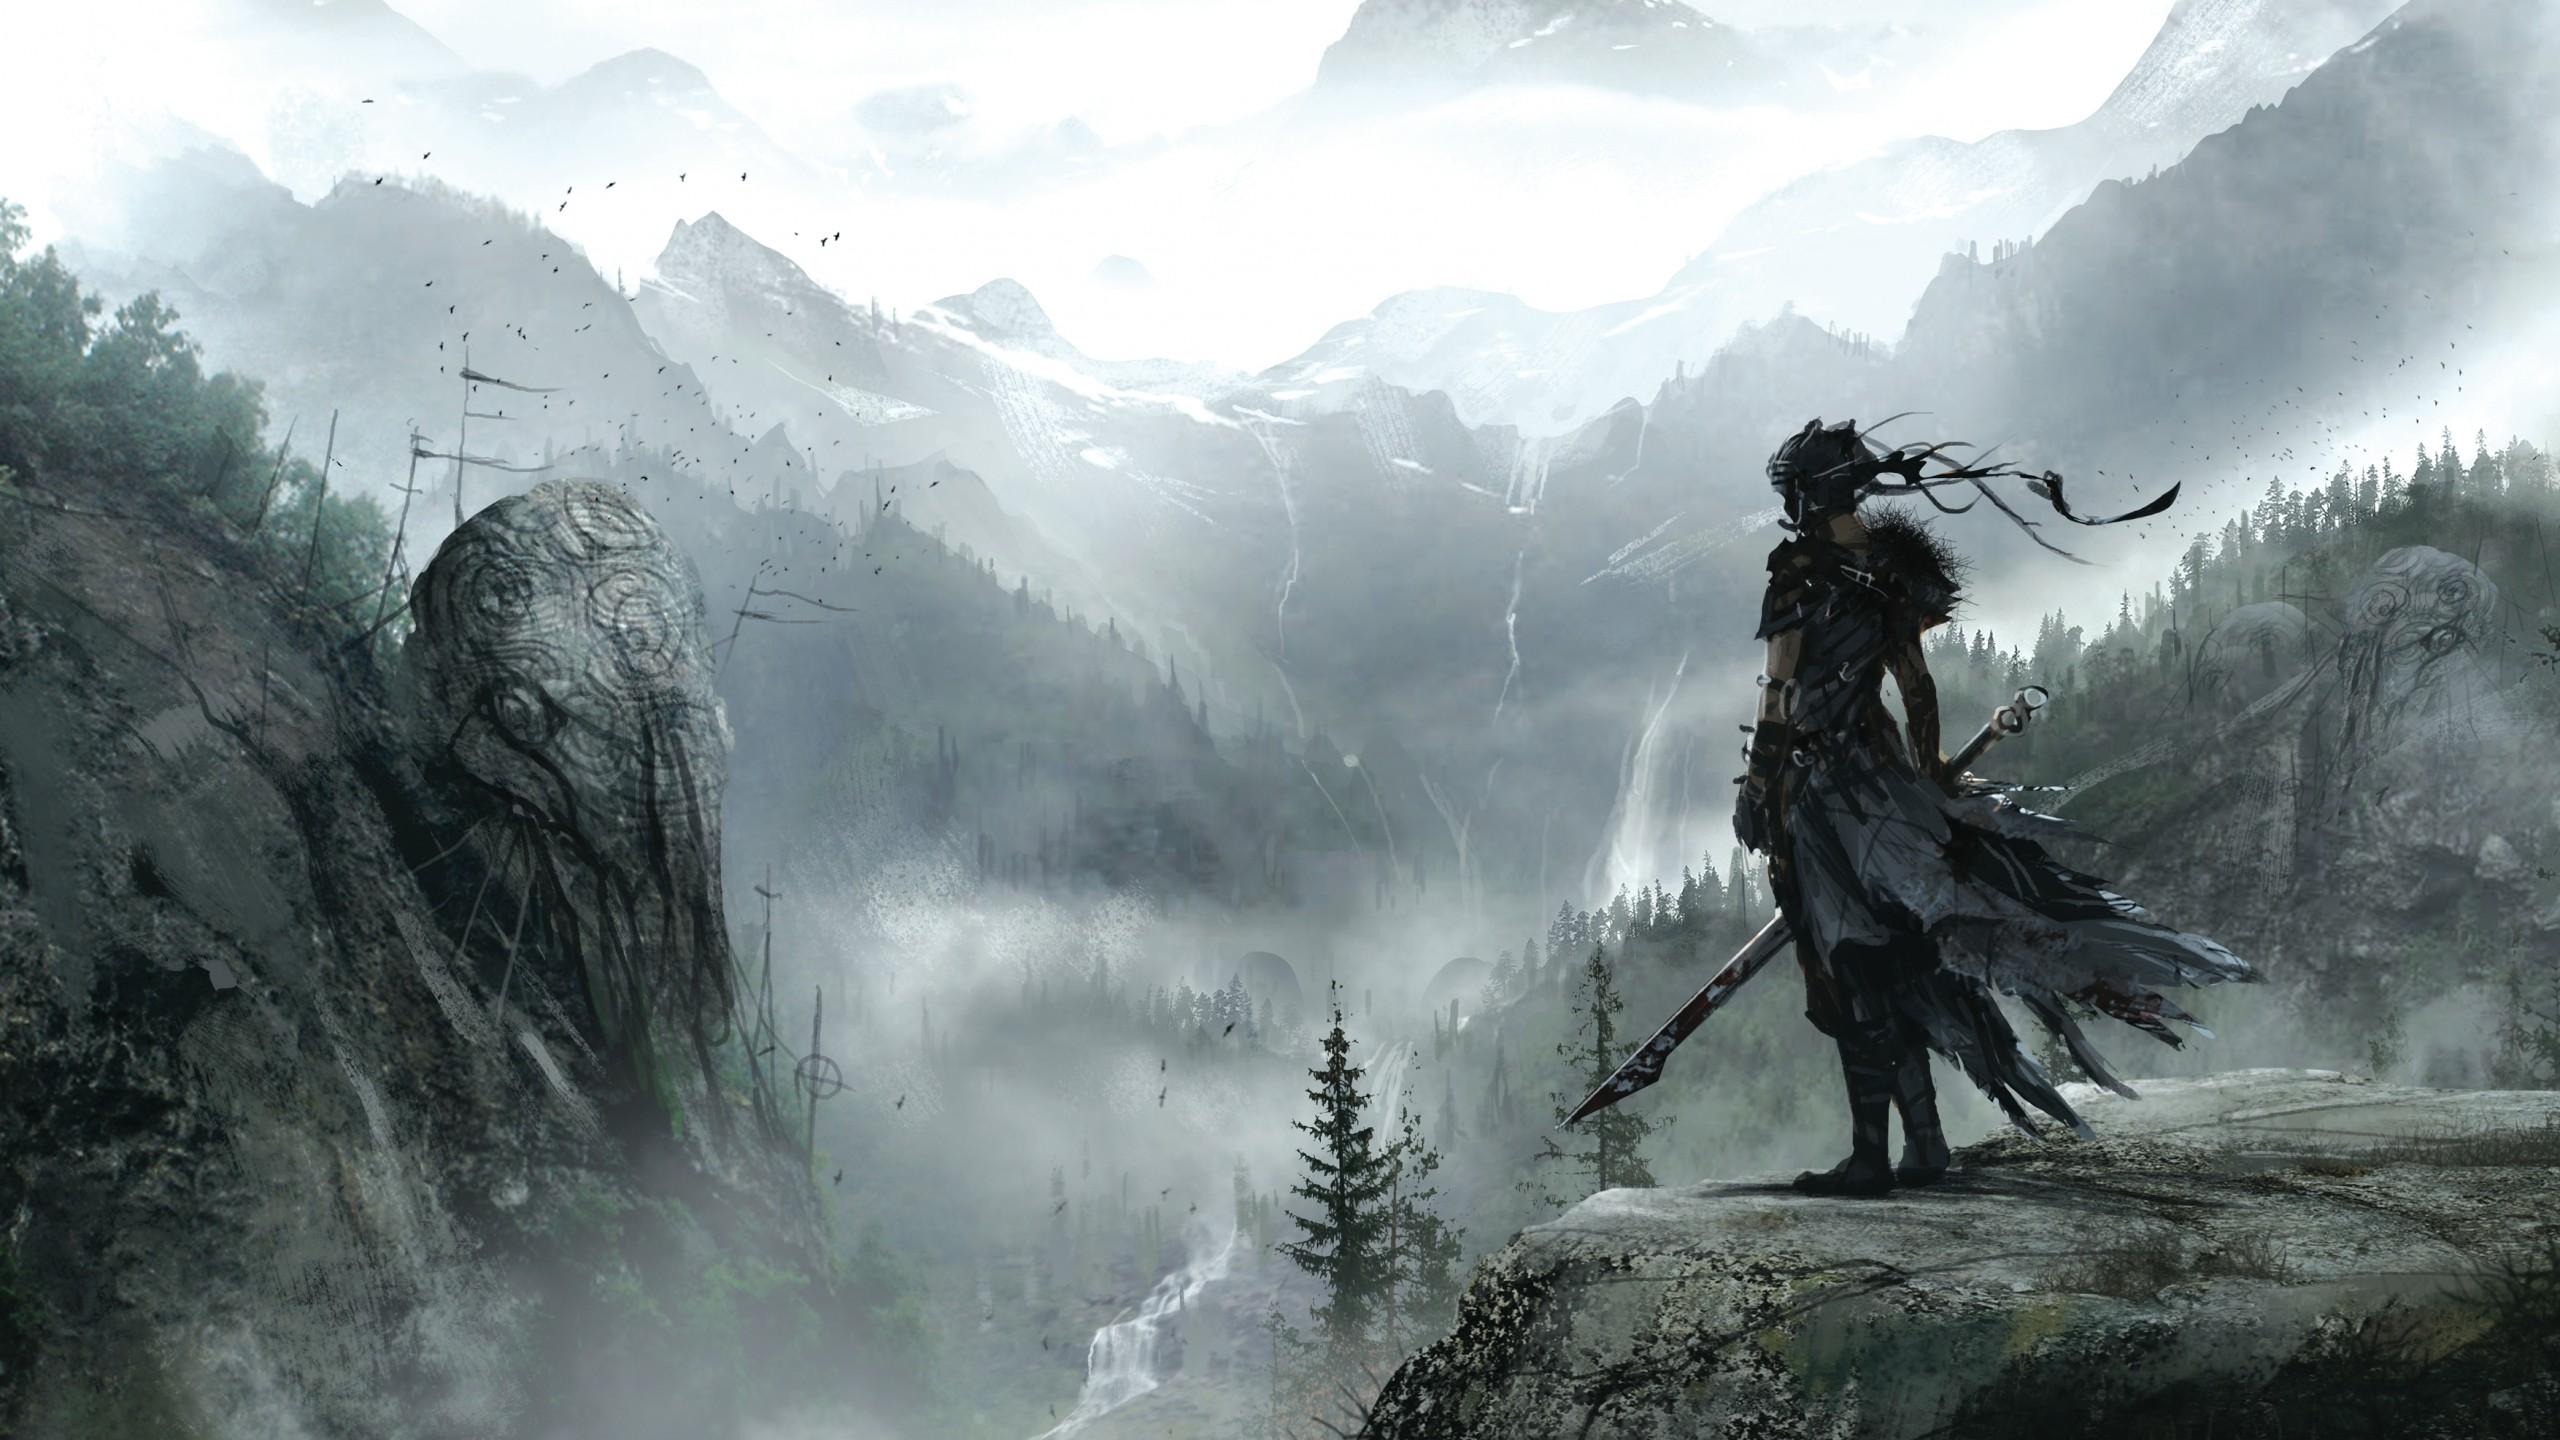 294 Best Fantasy Art 4 Images On Pinterest: Wallpaper Hellblade, Best Games, Fantasy, PC, PS4, Game